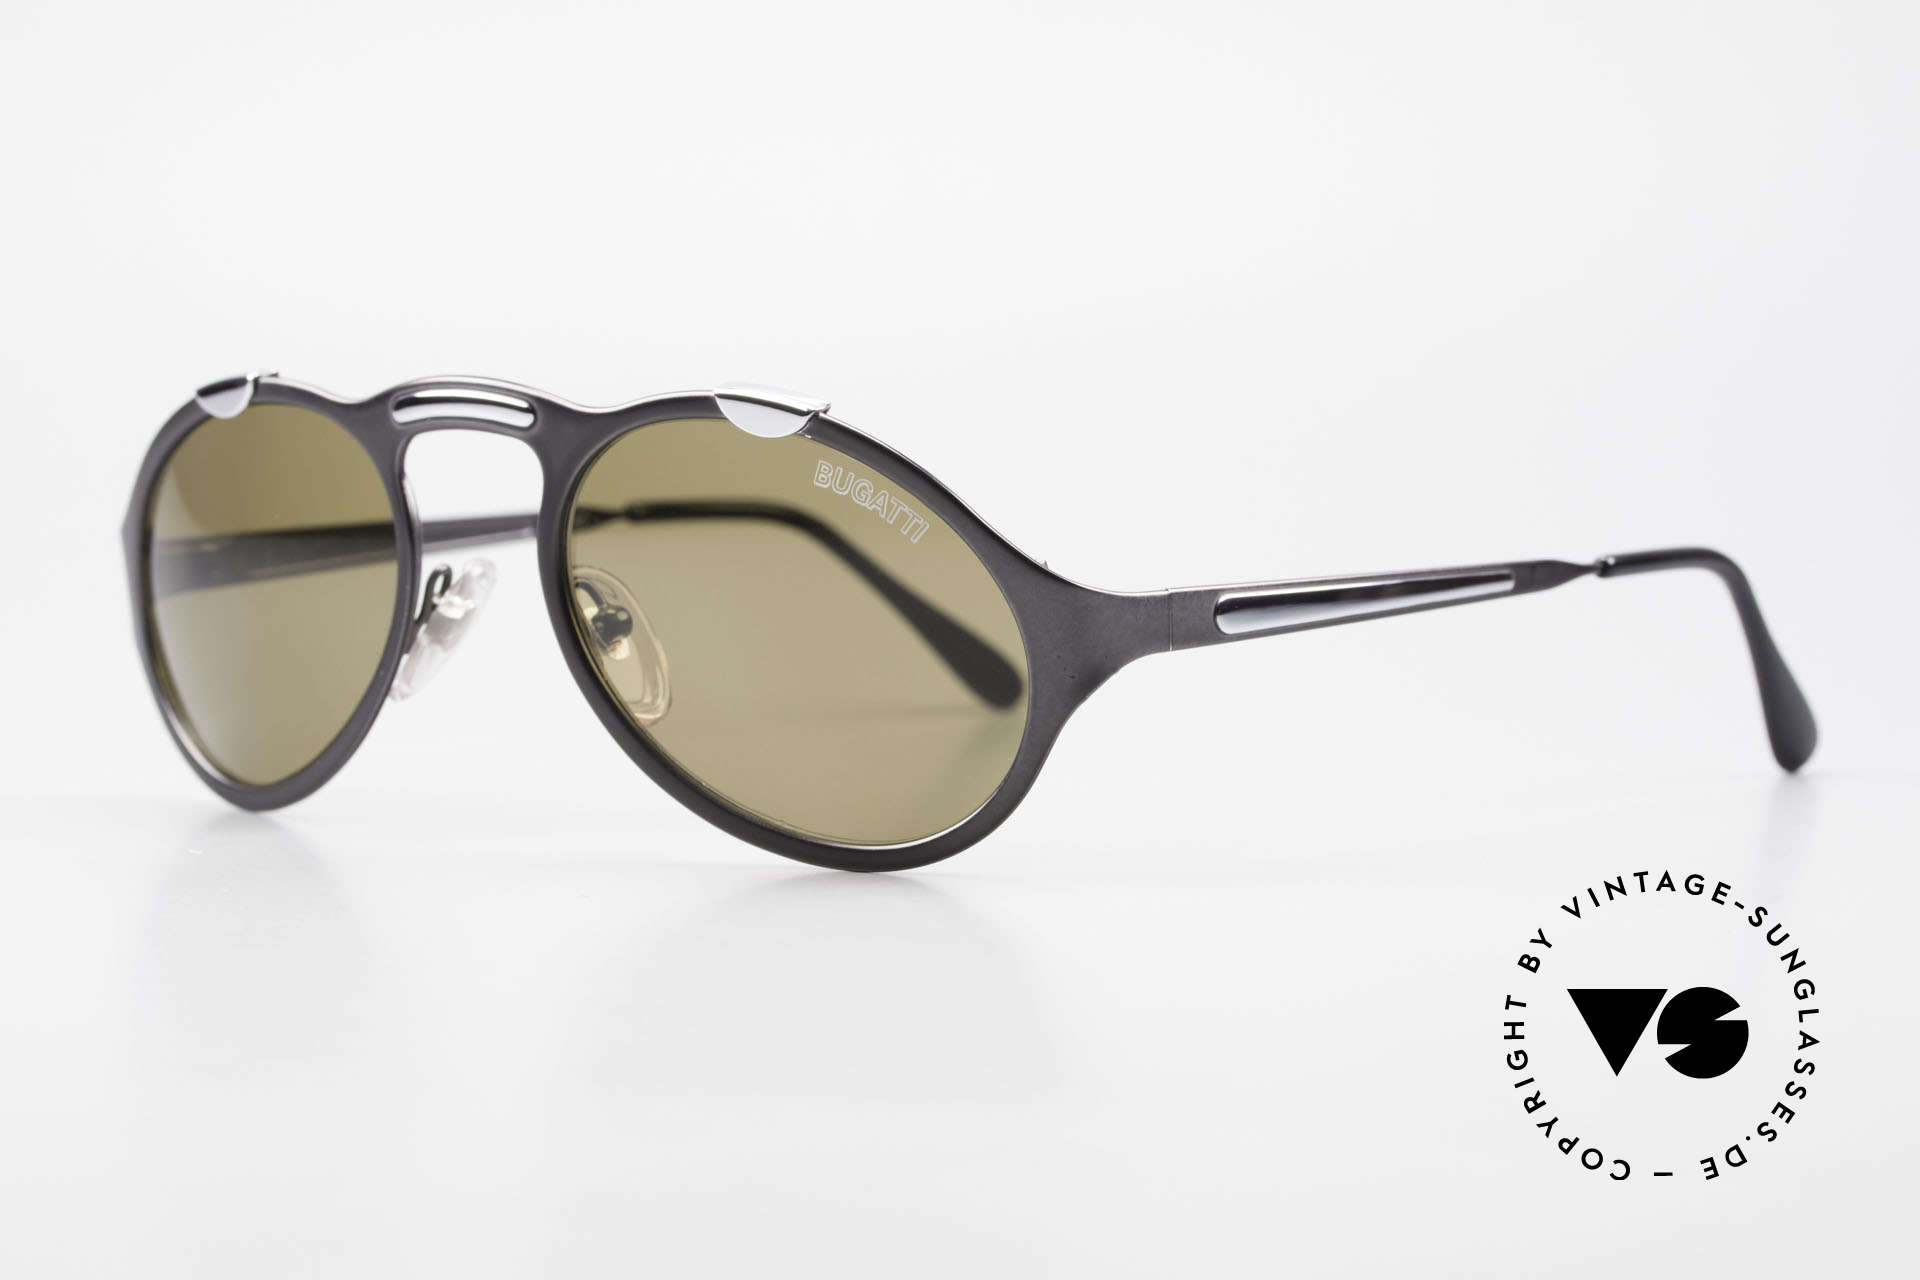 Bugatti 13152 Limited Rare Luxury 90's Sunglasses, ultra rare gray-metallic varnish, collector's item!, Made for Men